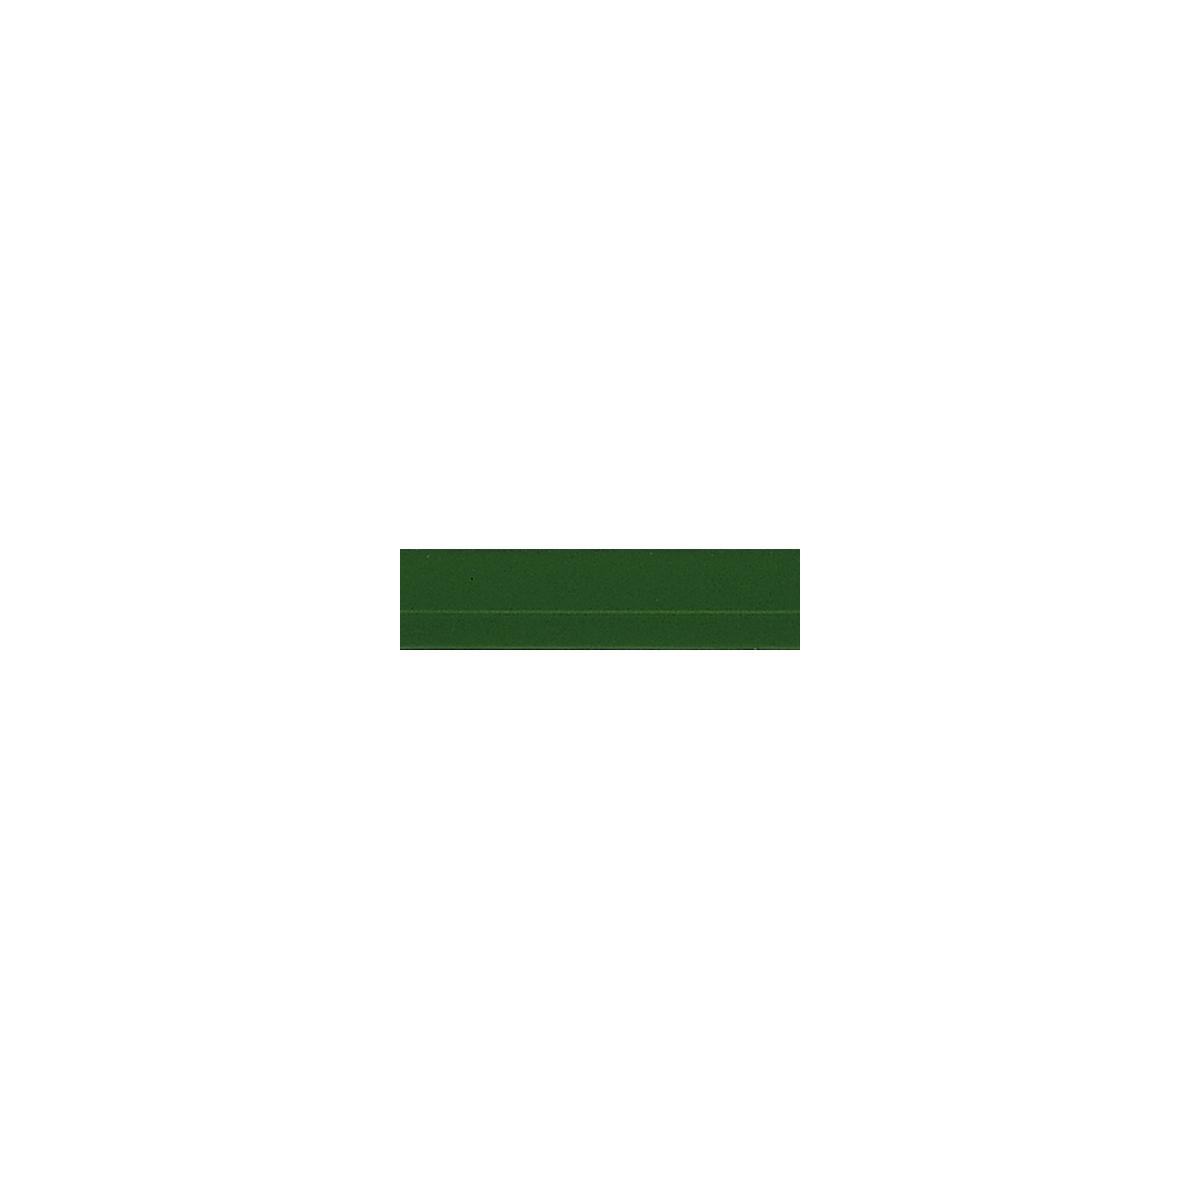 Moldura Verde - Serie Alhambra - Marca Mainzu